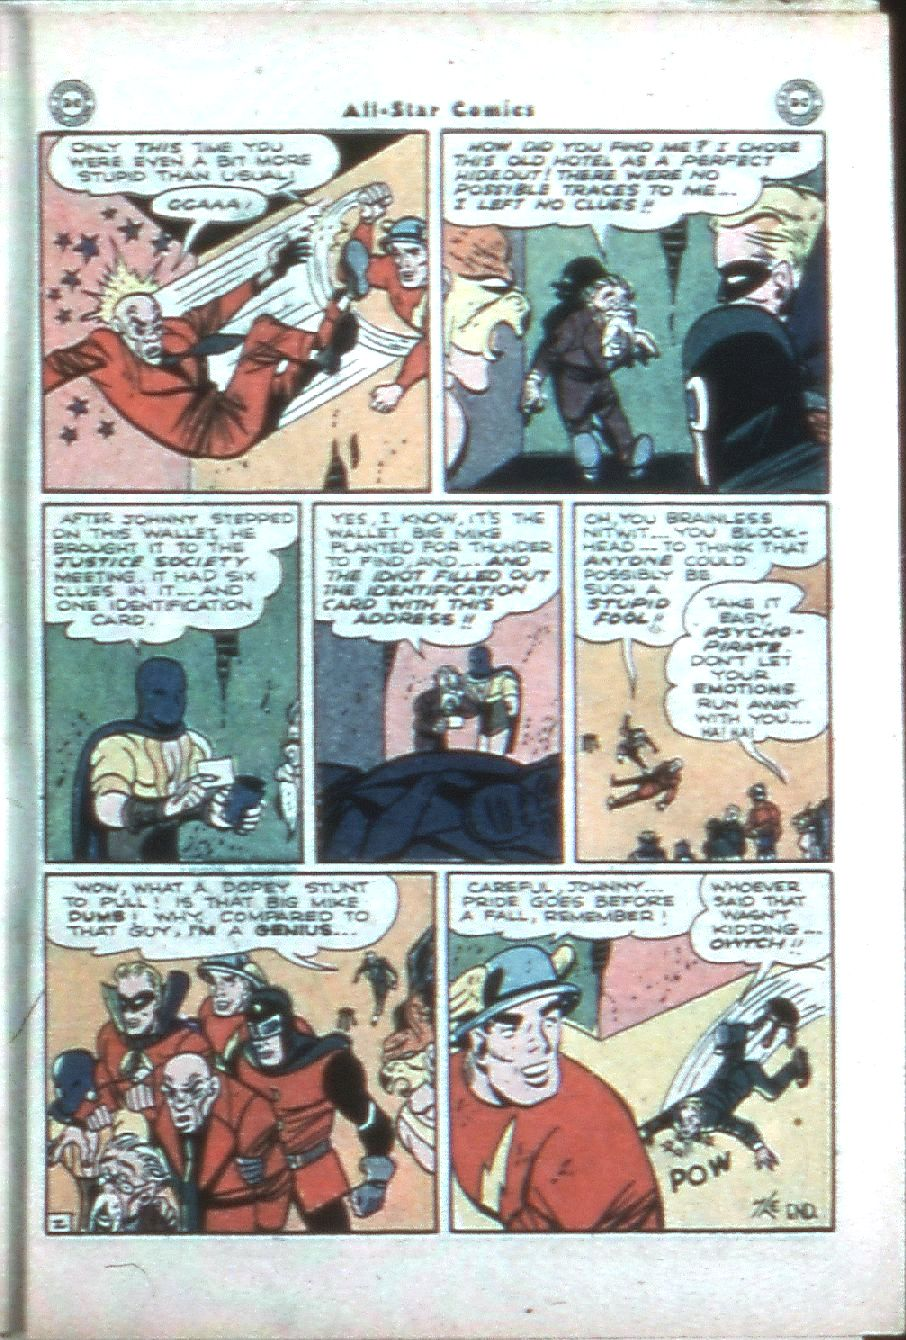 Read online All-Star Comics comic -  Issue #32 - 45